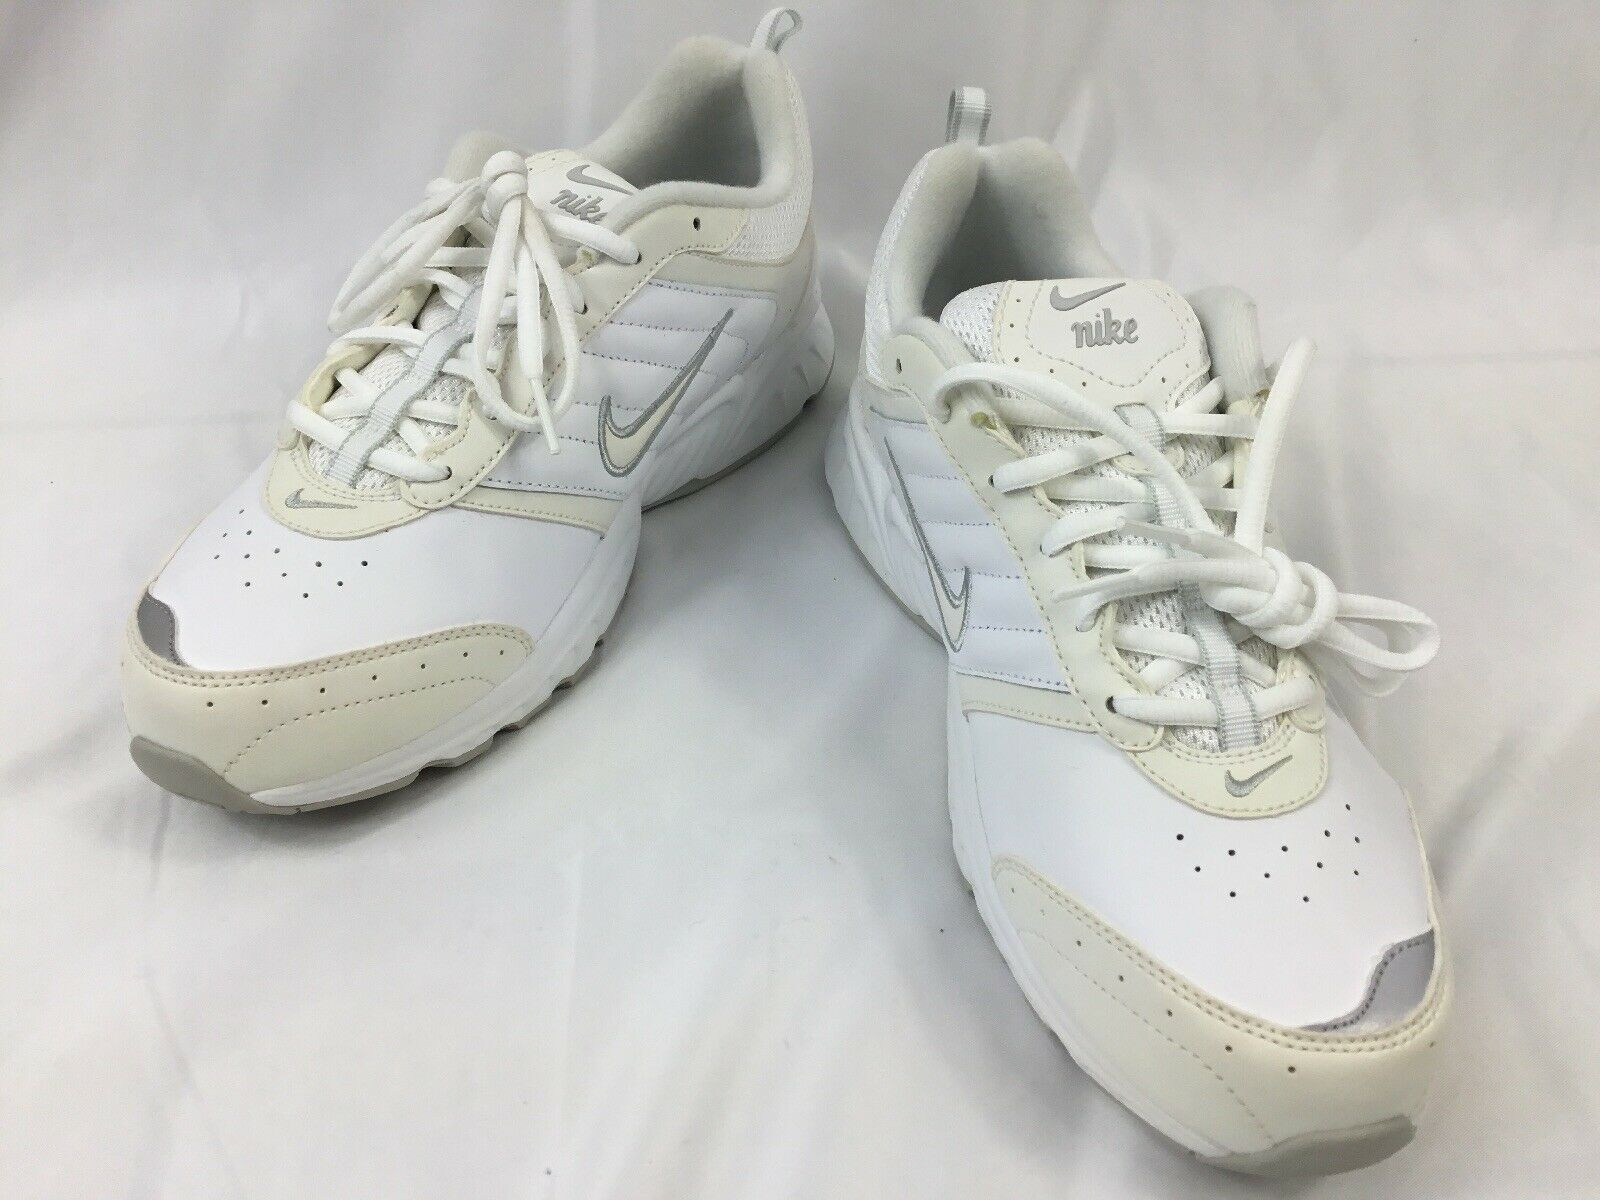 Nike View II Rolling Rail Men's Sneakers Walking shoes Size 9 White 318234-111